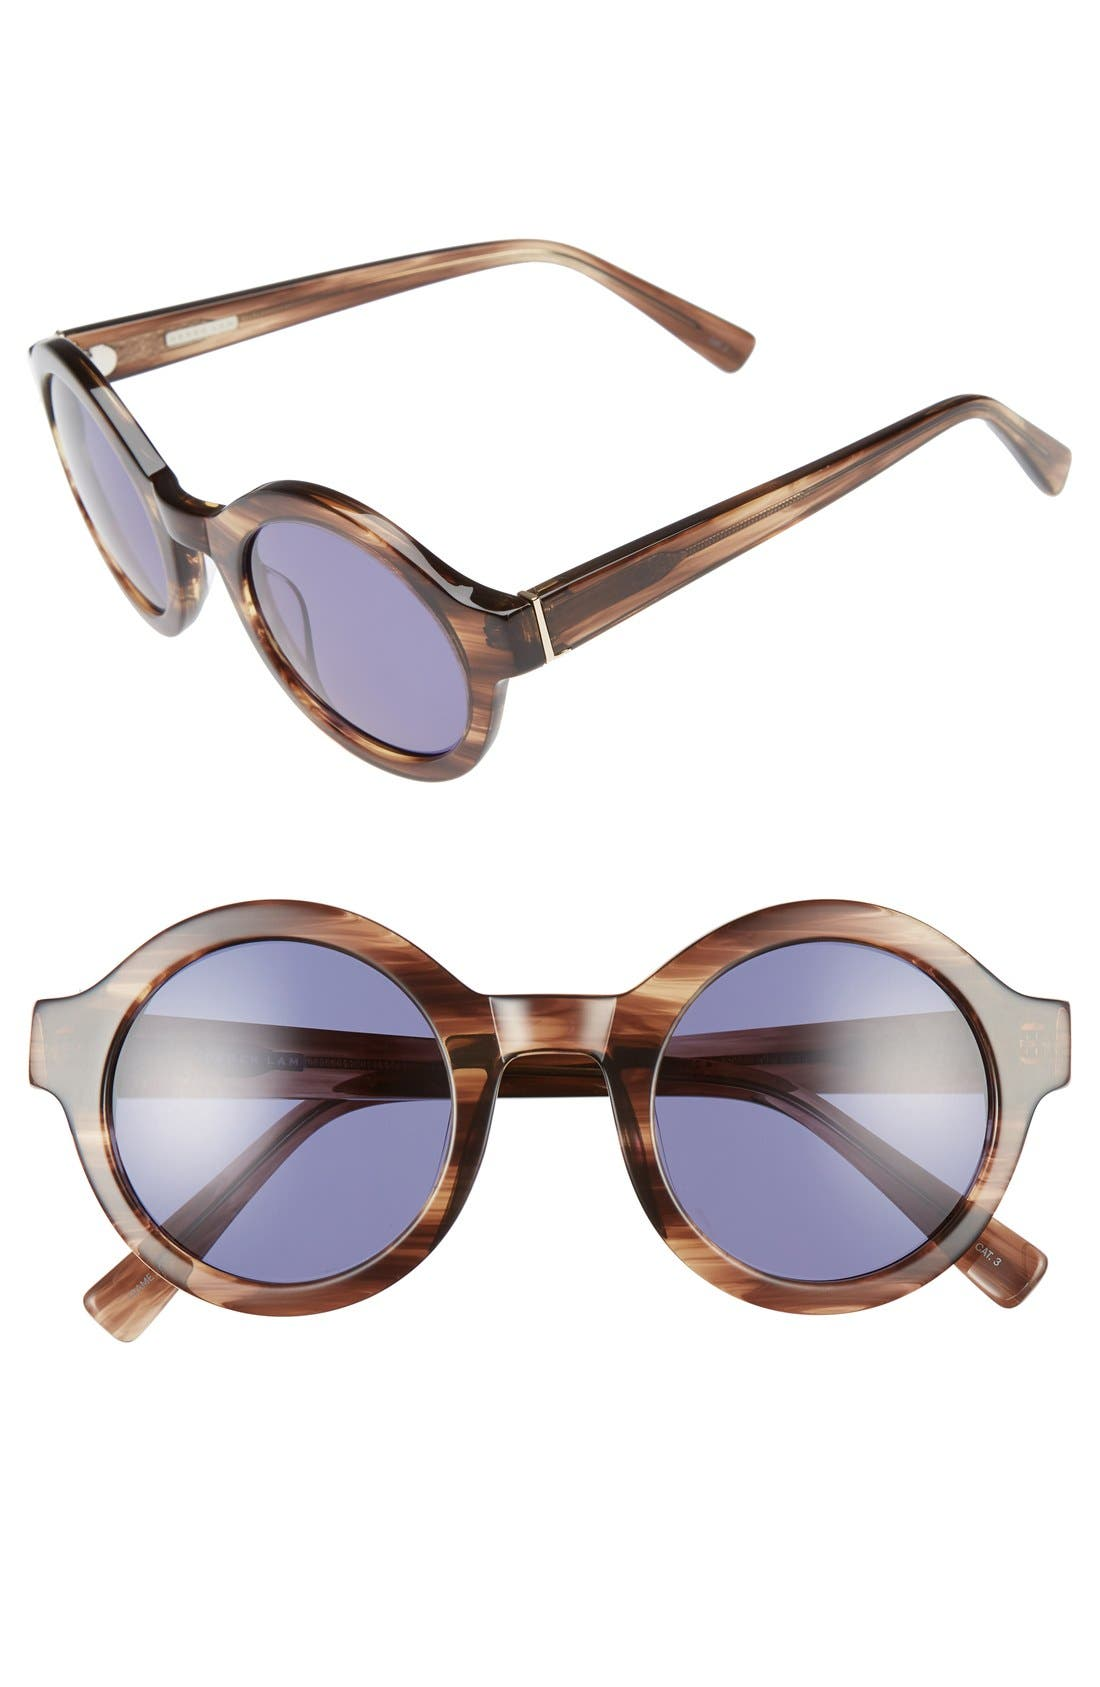 Alternate Image 1 Selected - Derek Lam 'Luna' 47mm Round Sunglasses